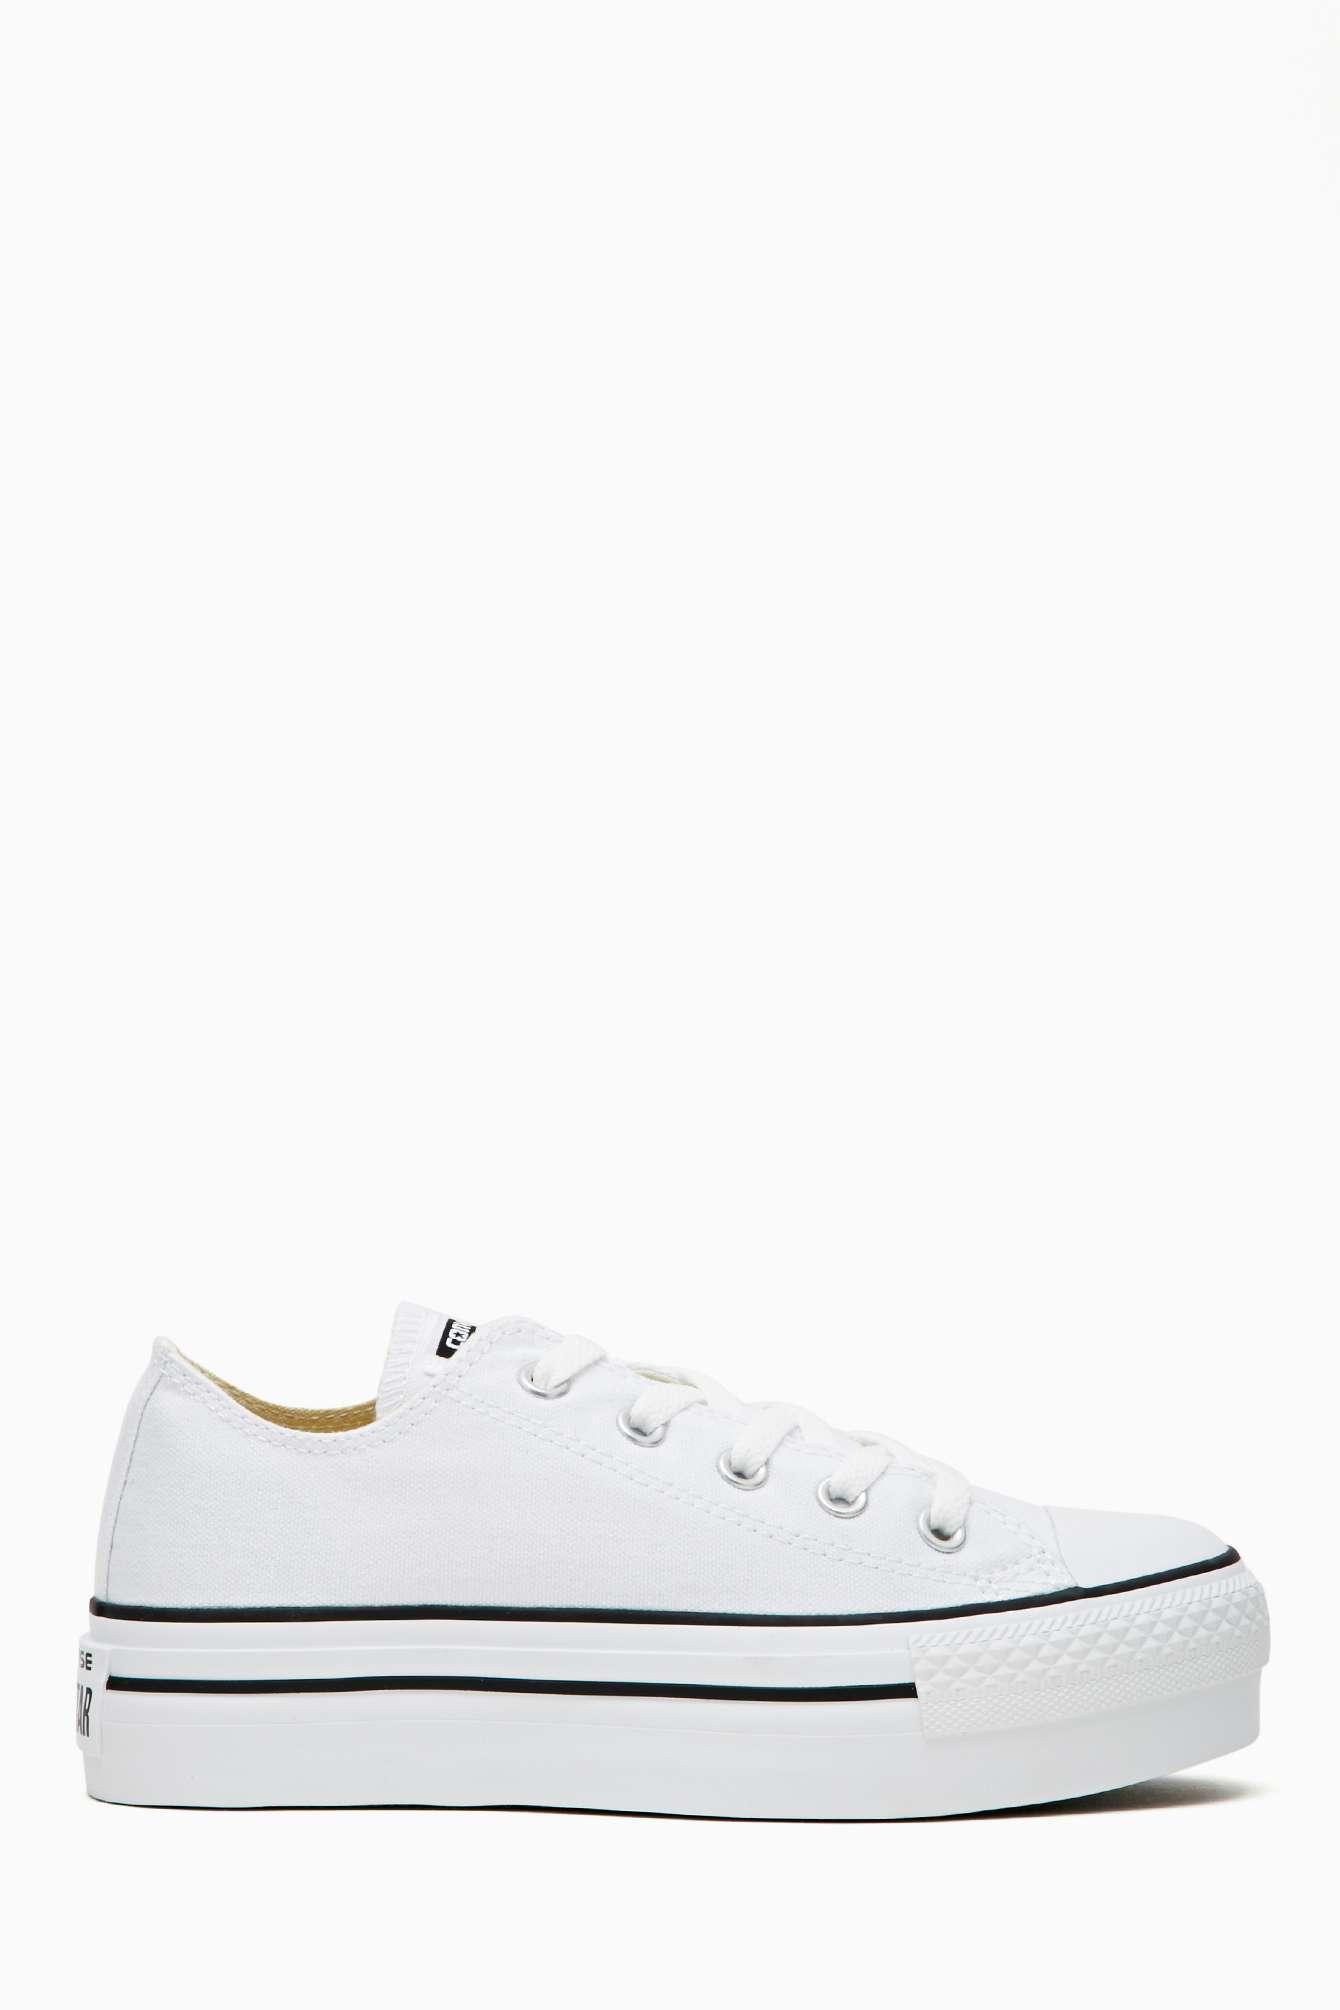 Nasty Gal Converse All Star Platform Sneaker In White Lyst